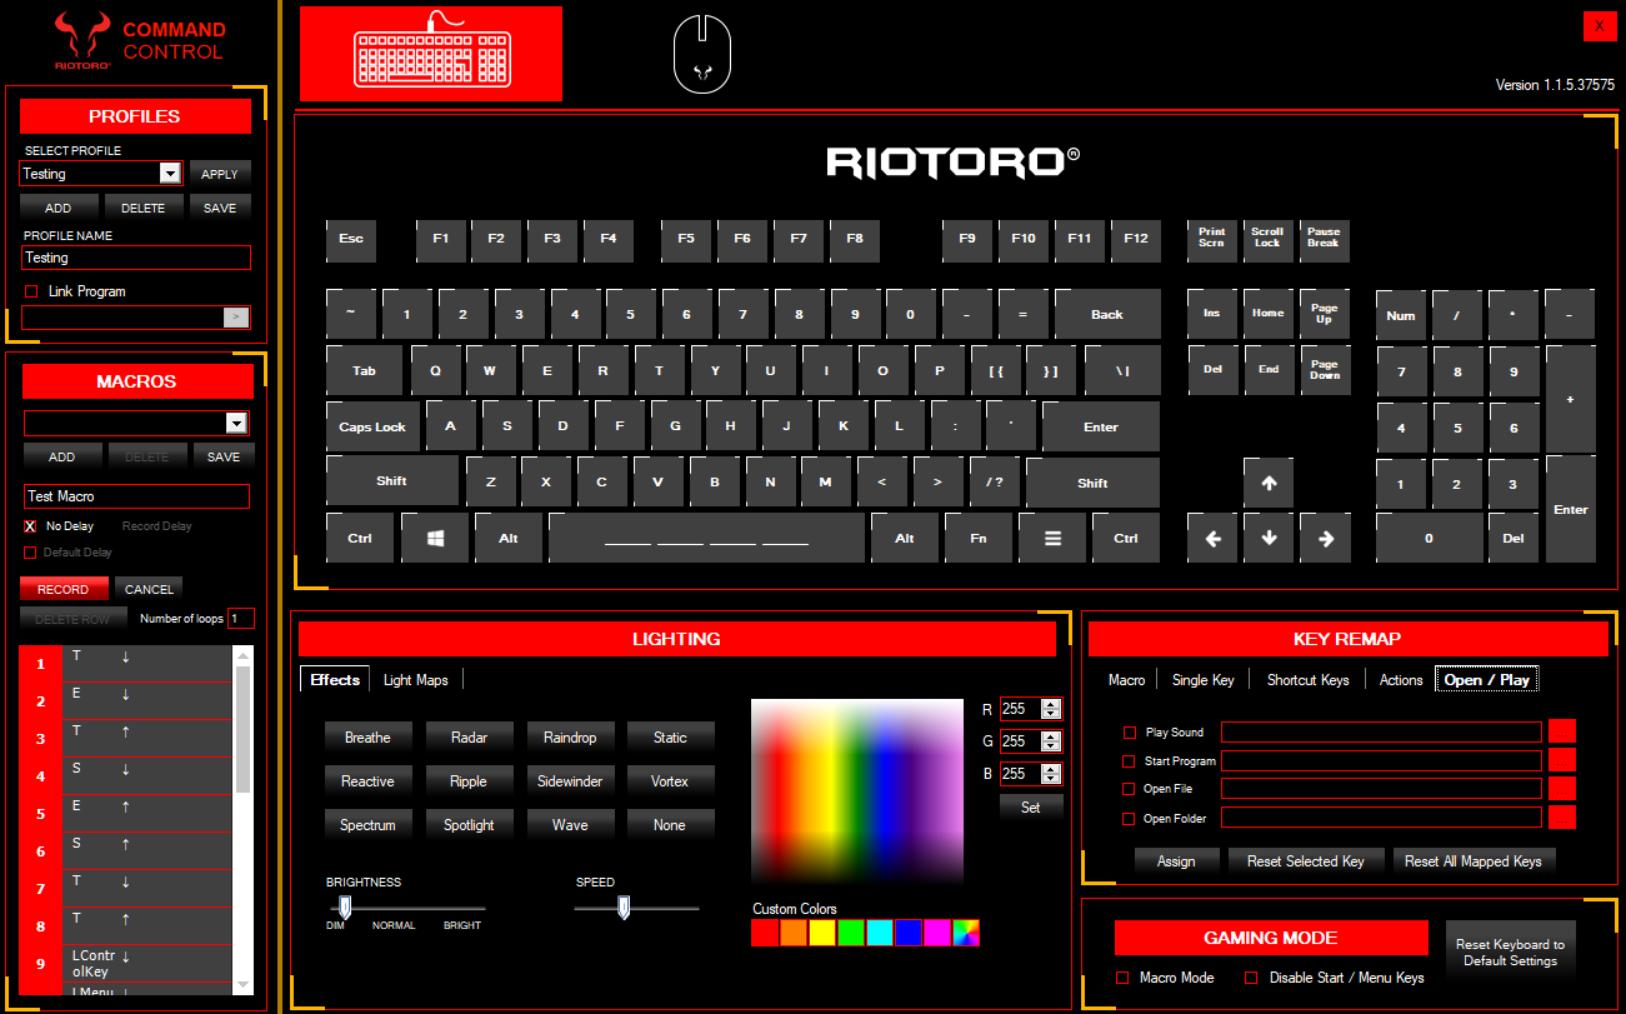 Software - The Riotoro Prism Gaming Mechanical Keyboard